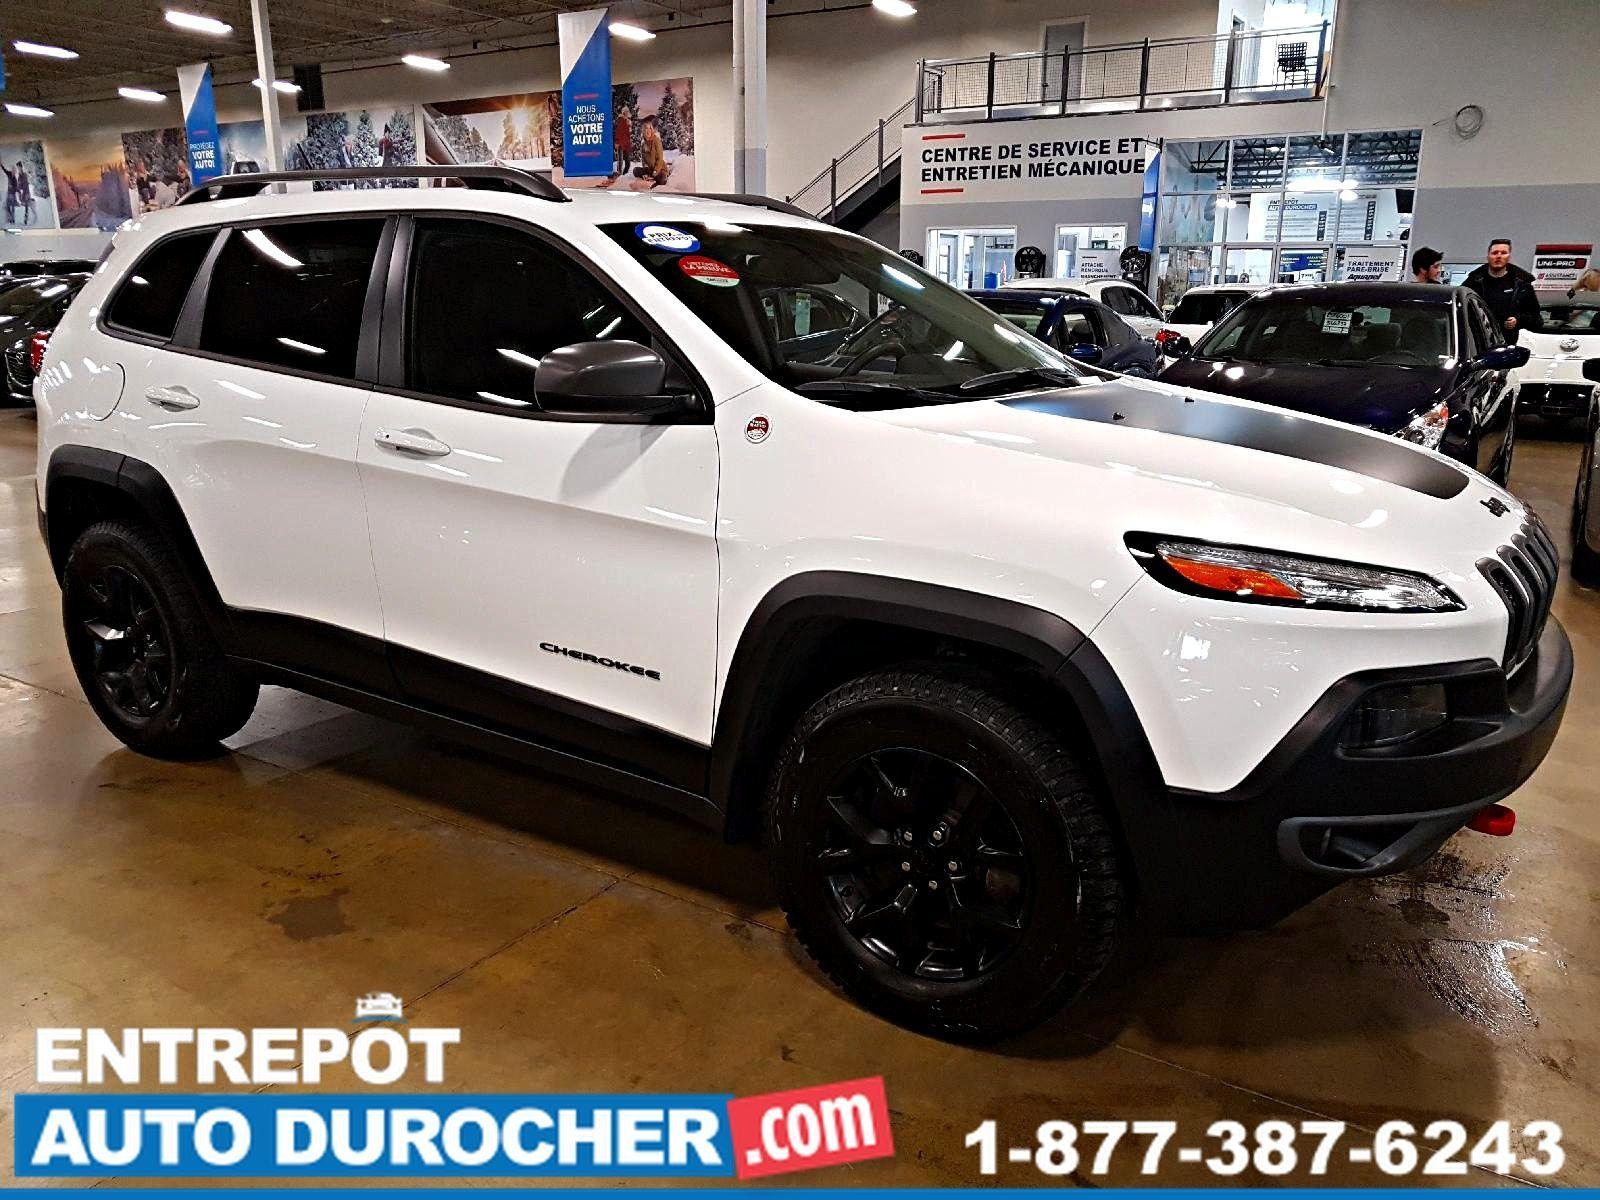 2015  Jeep Cherokee Trailhawk AWD - Automatique - Cuir